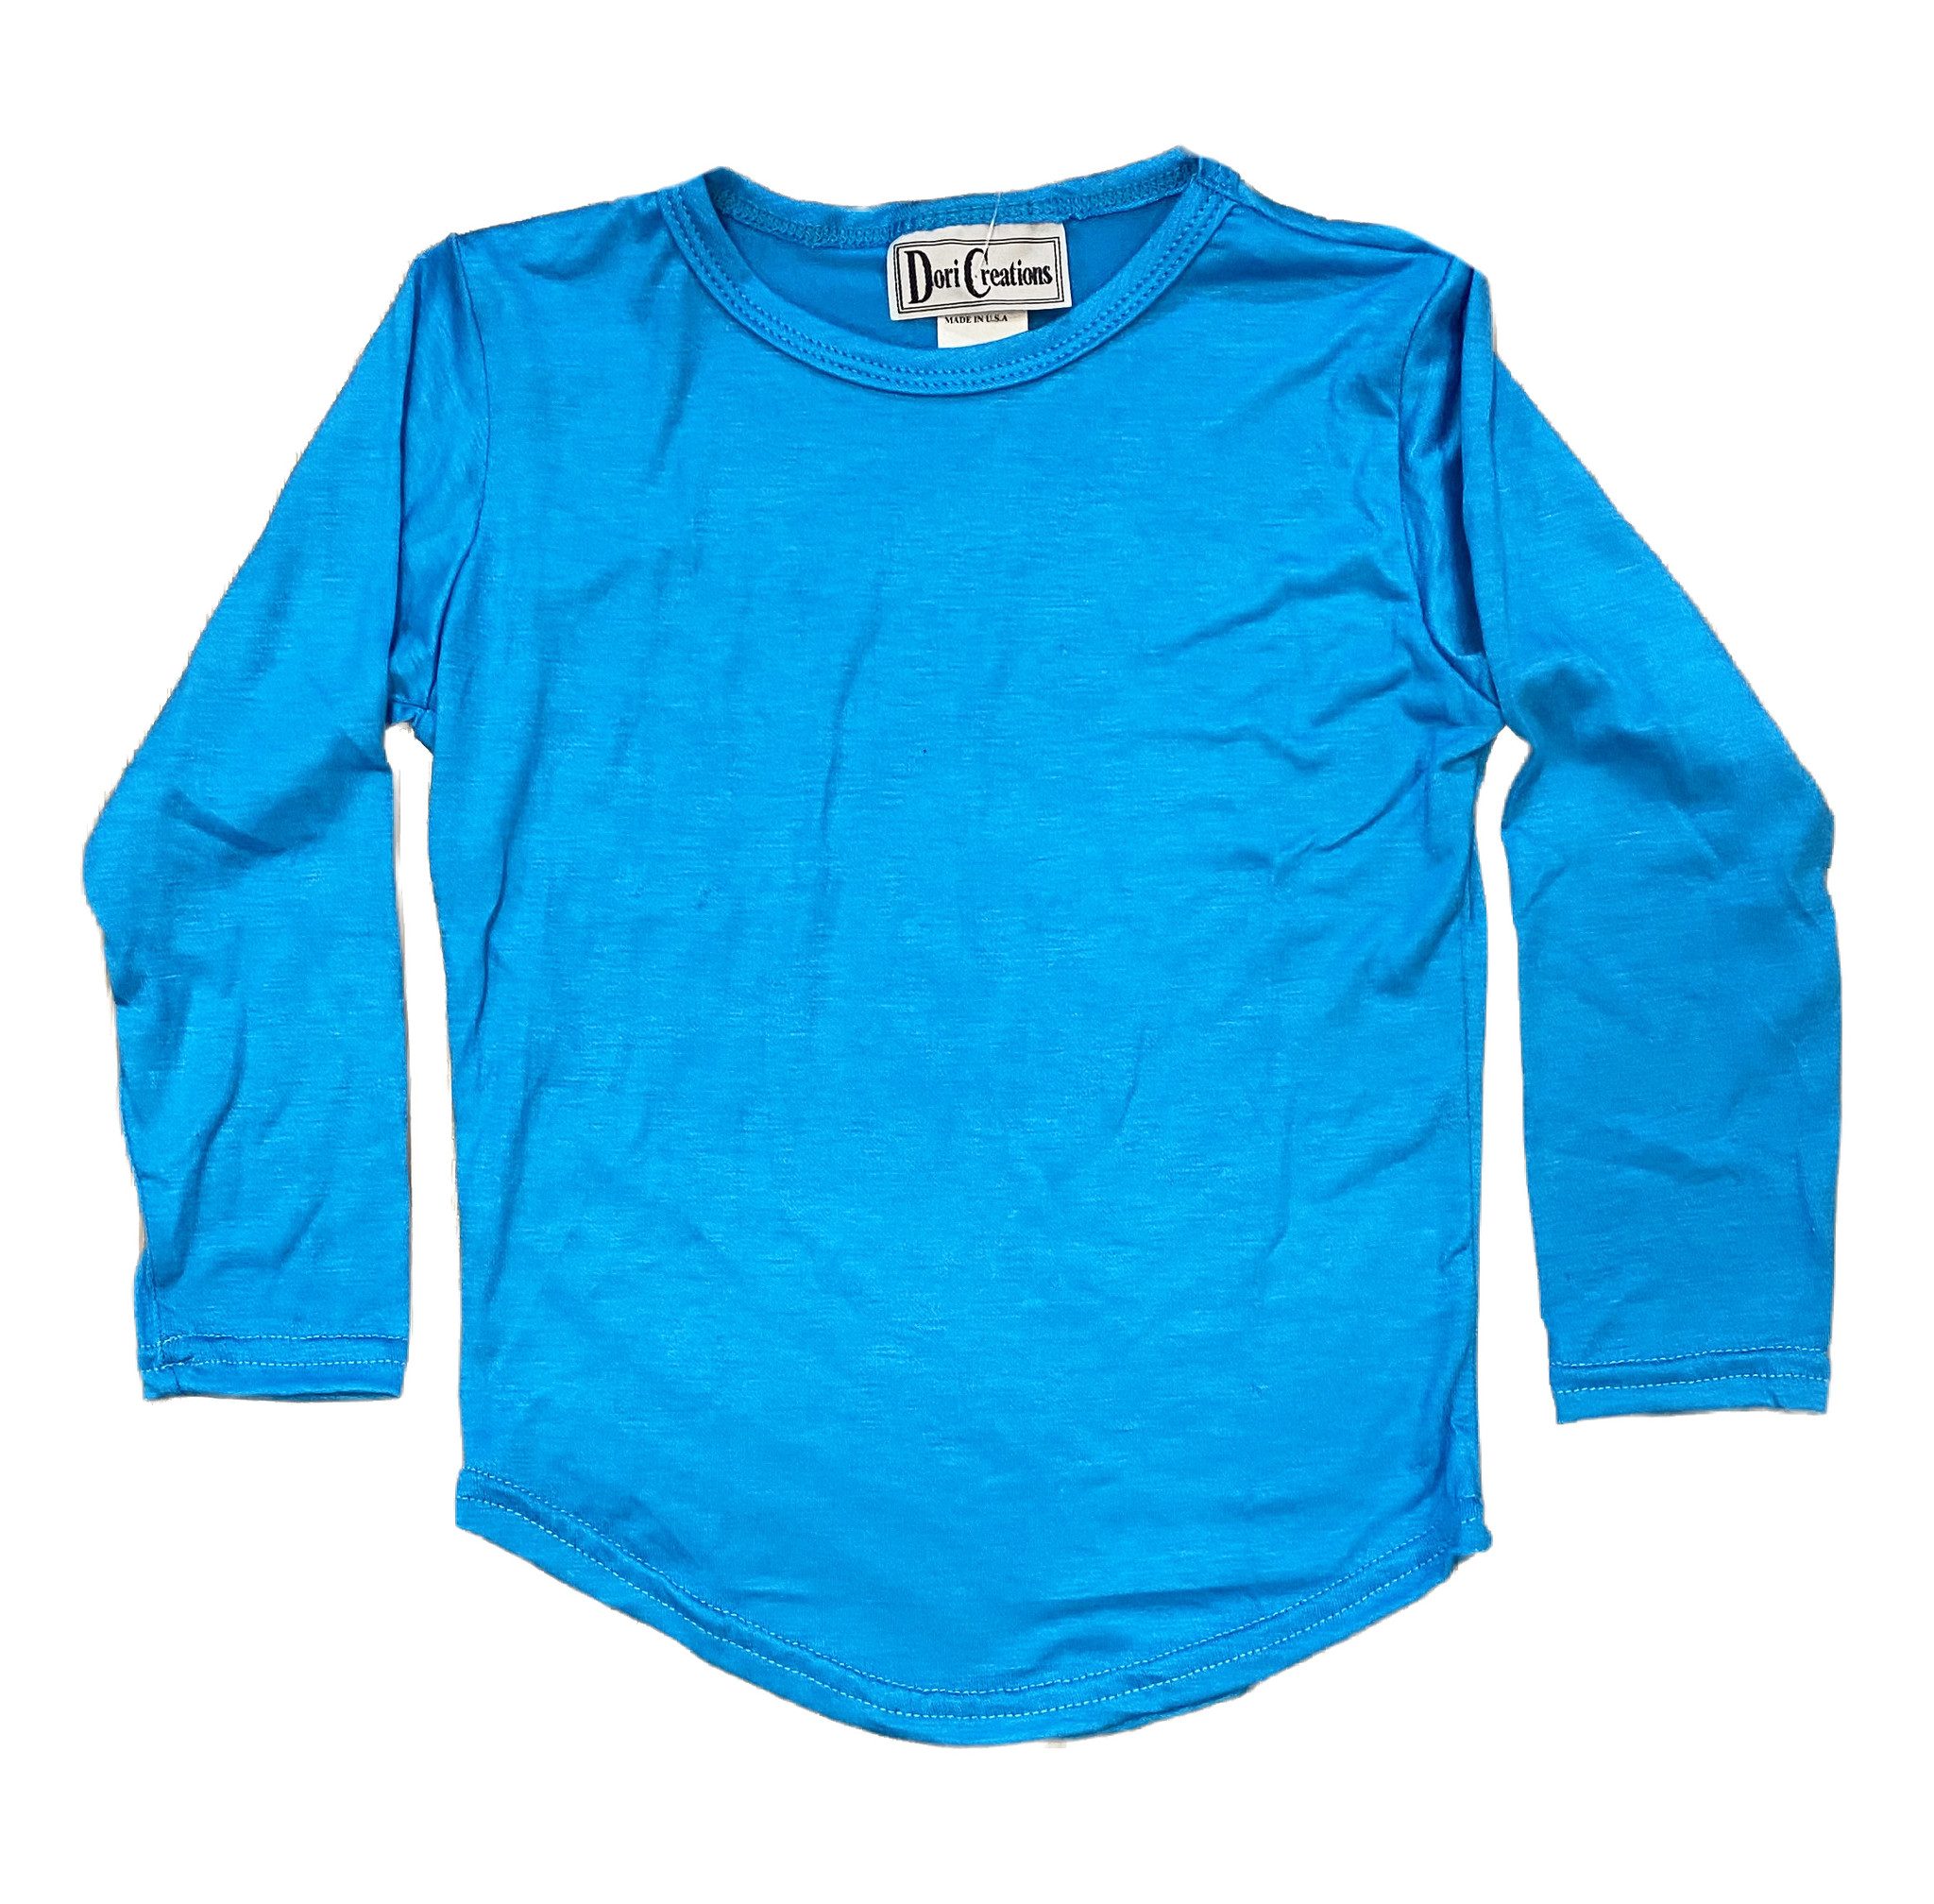 Dori Turquoise Long Sleeve Tee